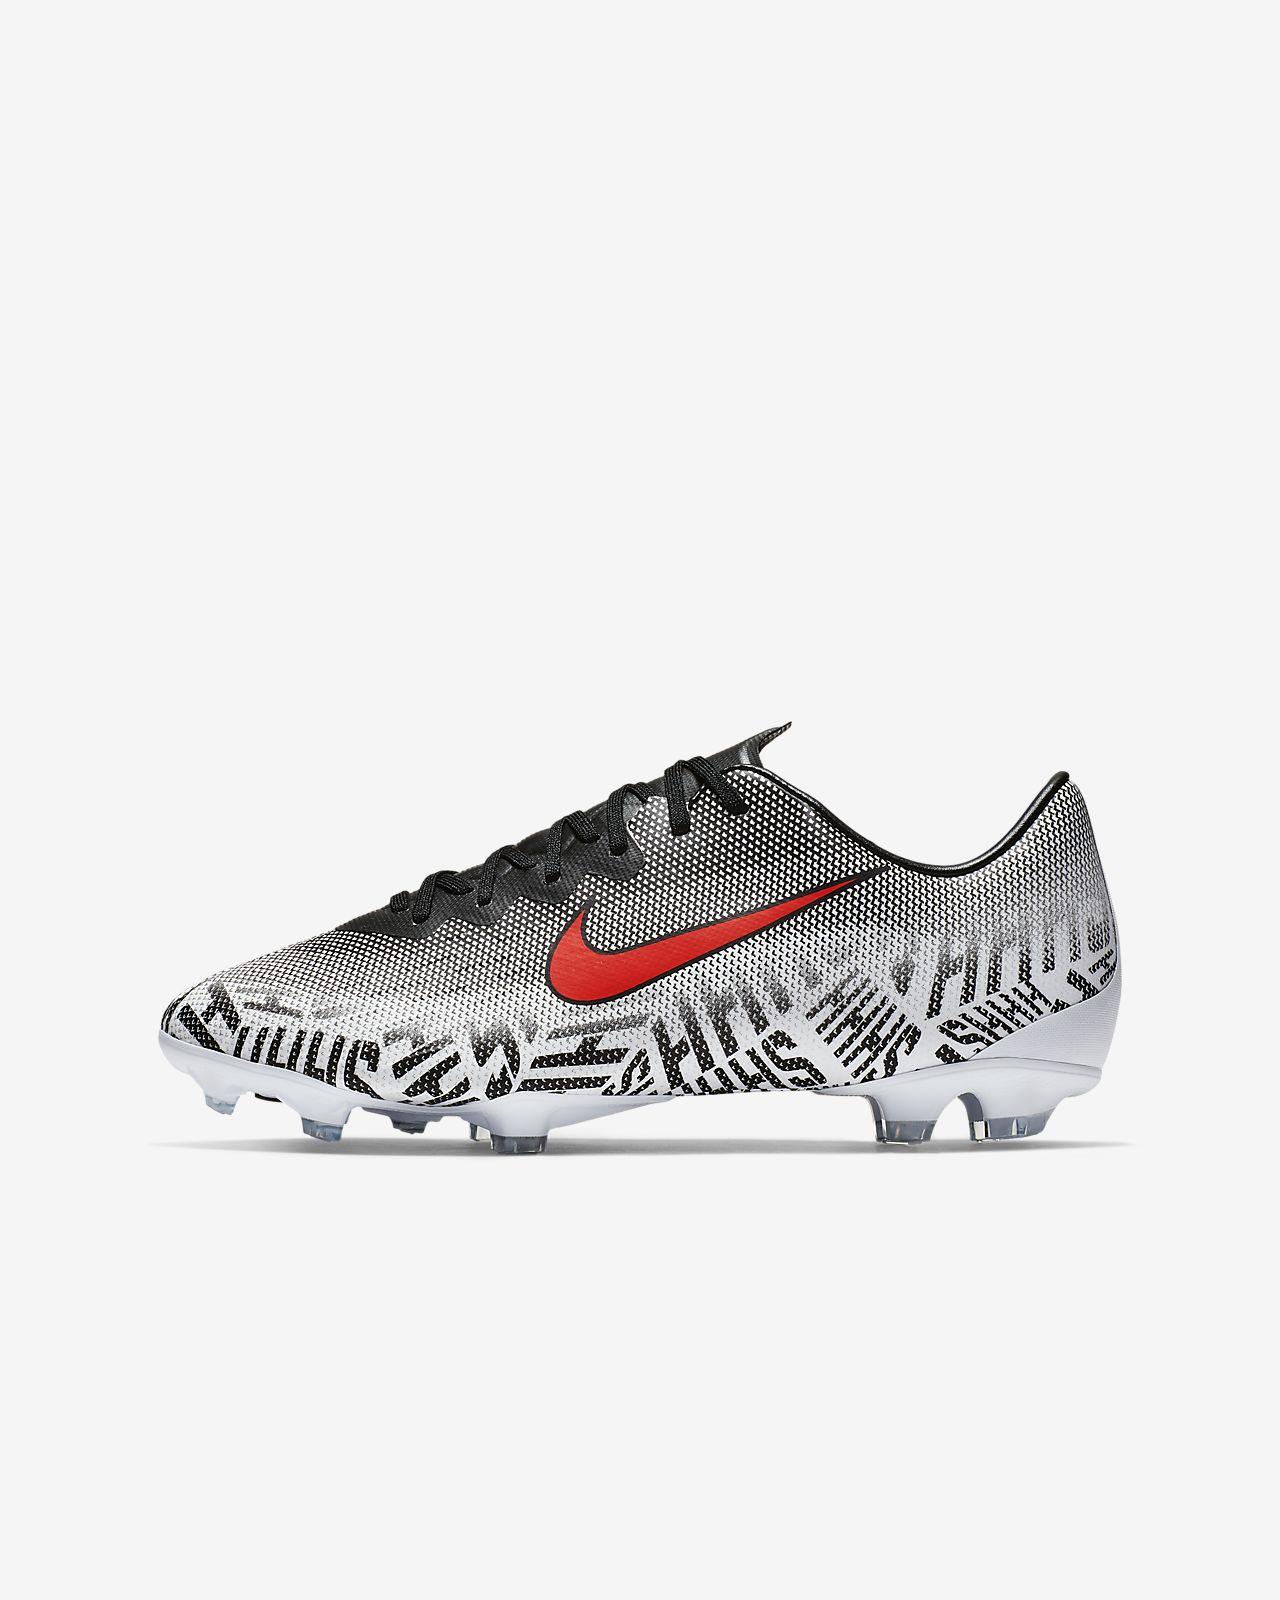 f826881d6aeb3 ... Nike Jr. Mercurial Vapor 12 Elite Neymar Jr. FG Botas de fútbol para  terreno